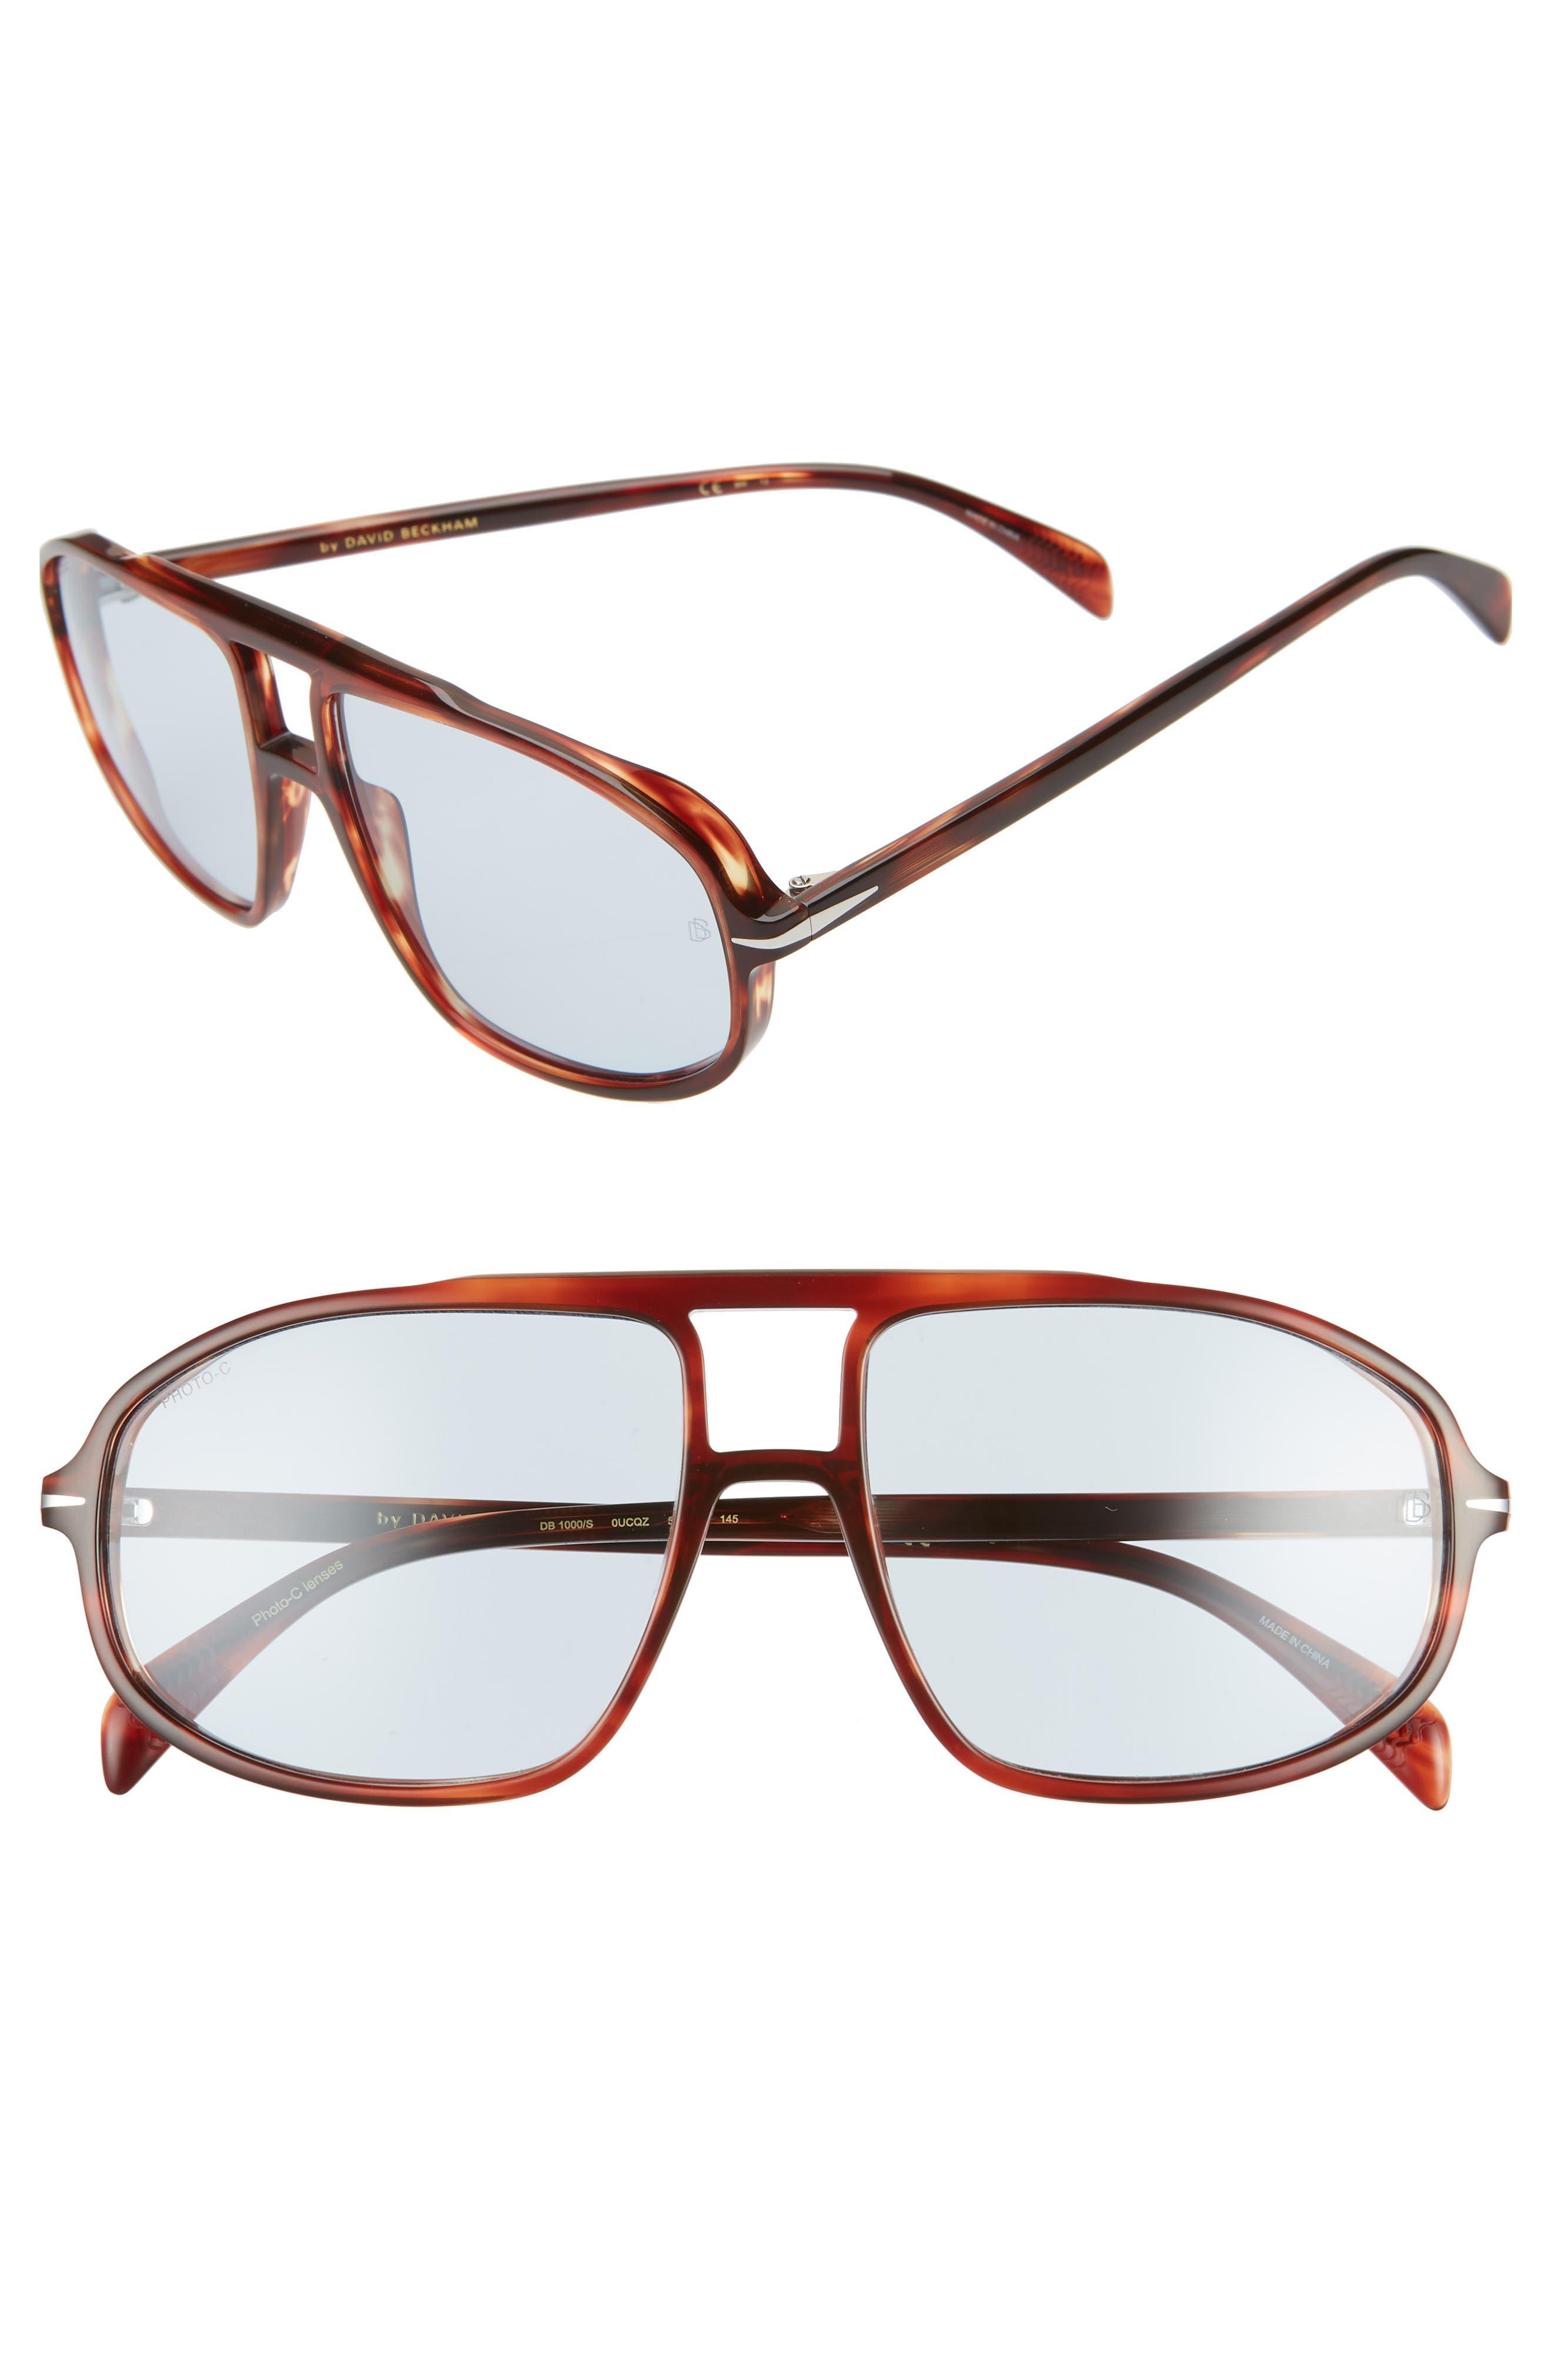 Men's Eyewear By David Beckham Db 1000/s 59mm Photochromic Pilot Sunglasses